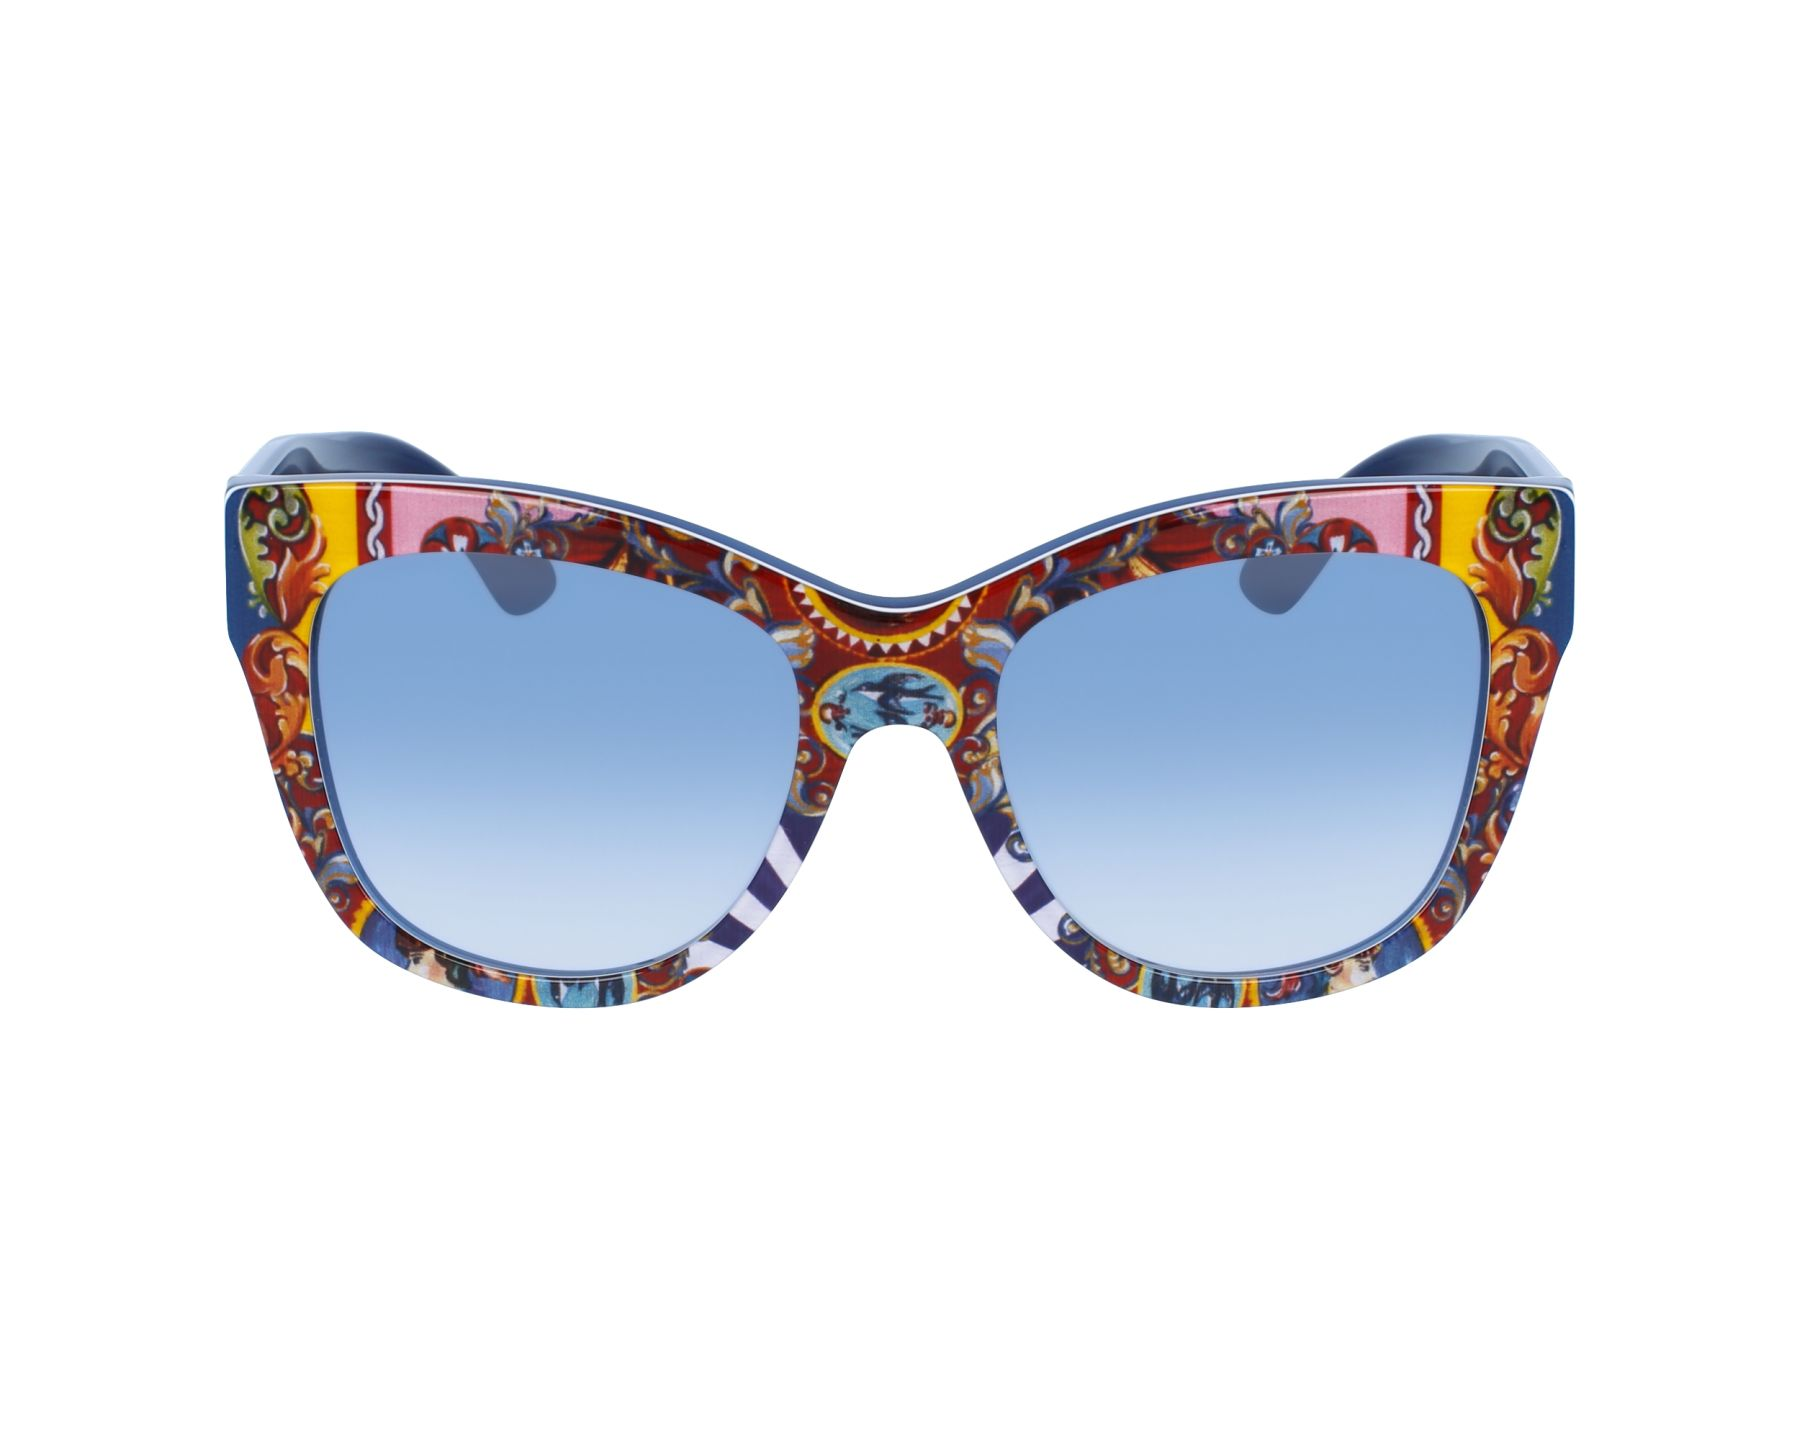 Dolce&gabbana Sonnenbrille Dg4270 sMDEvYd7